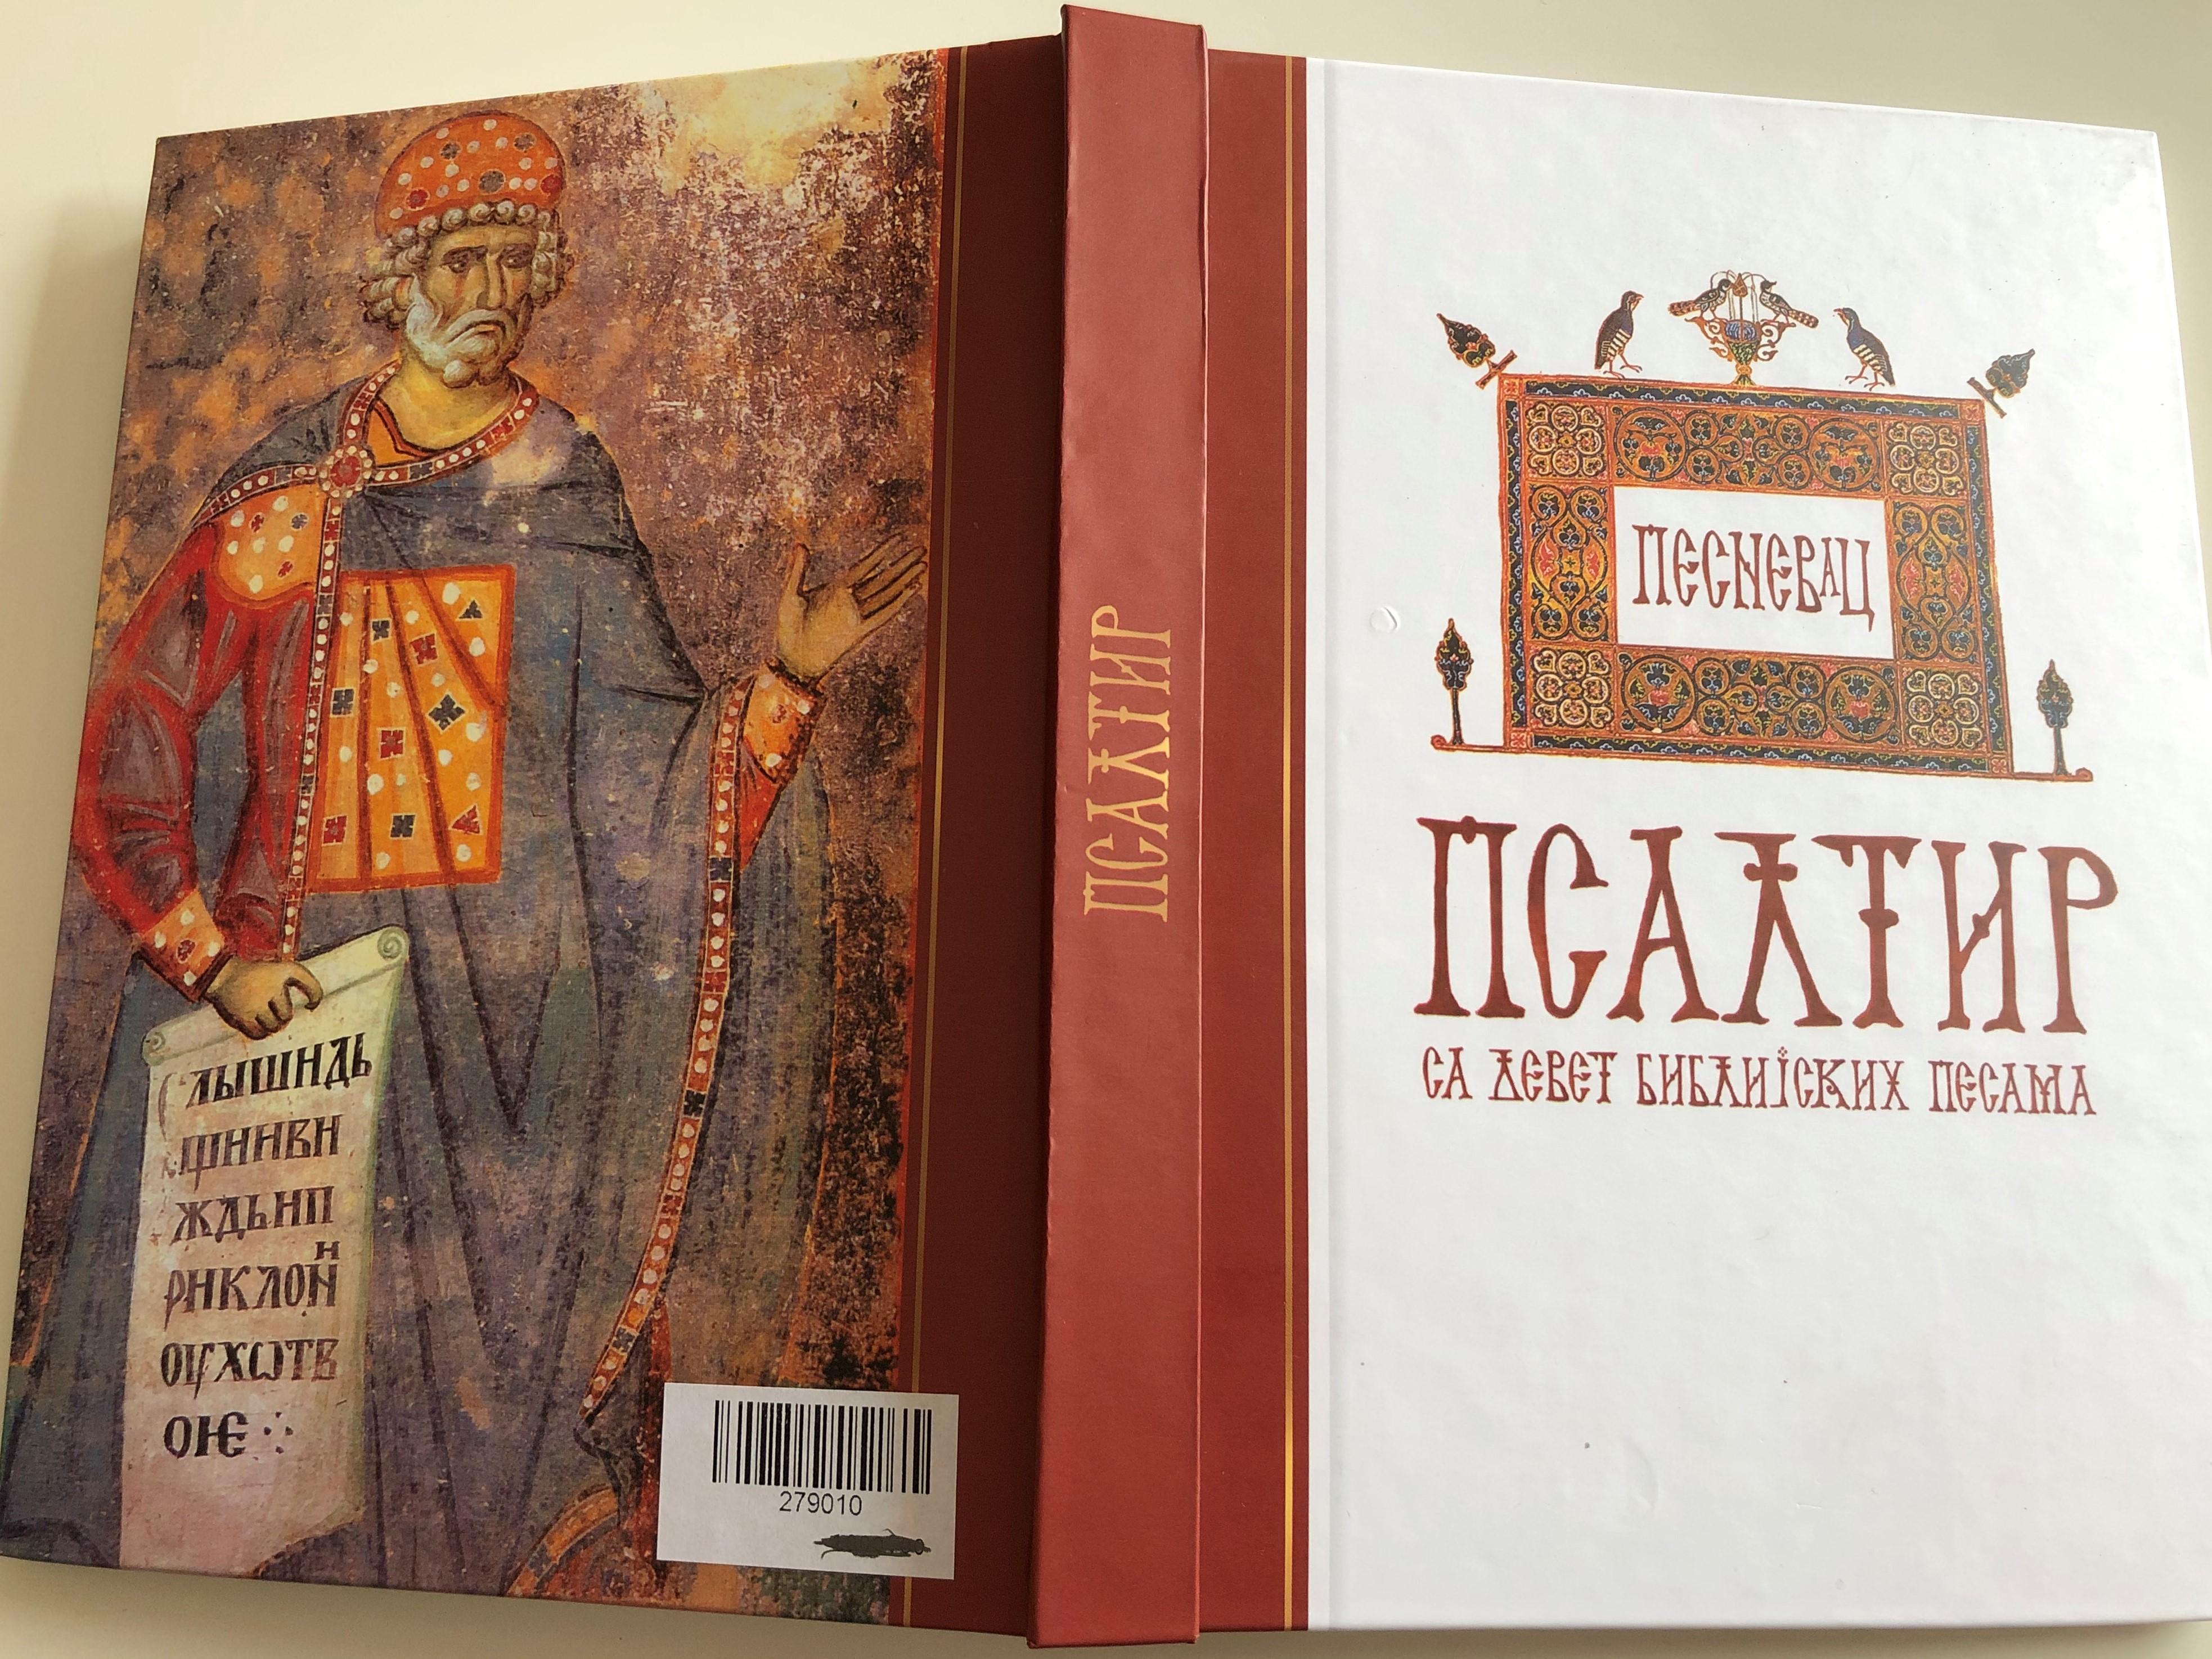 serbian-psalm-book-with-9-biblical-songs-13-.jpg